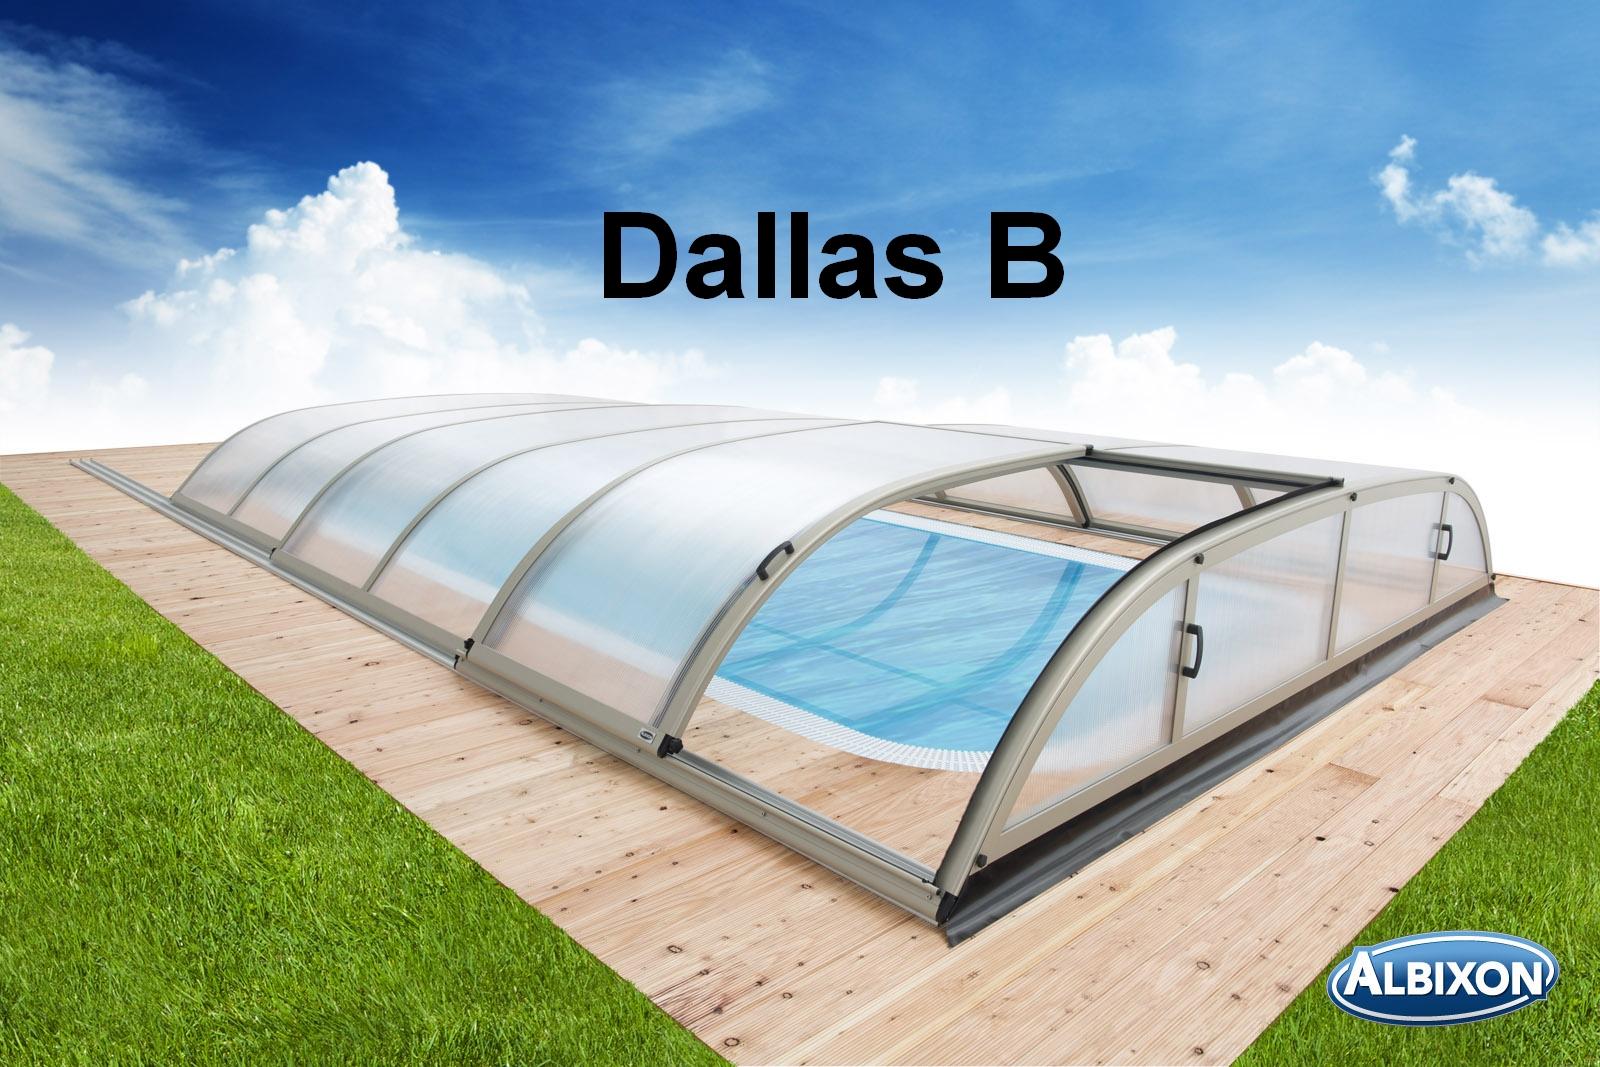 DALLAS B - 860 x 520 x 100 cm